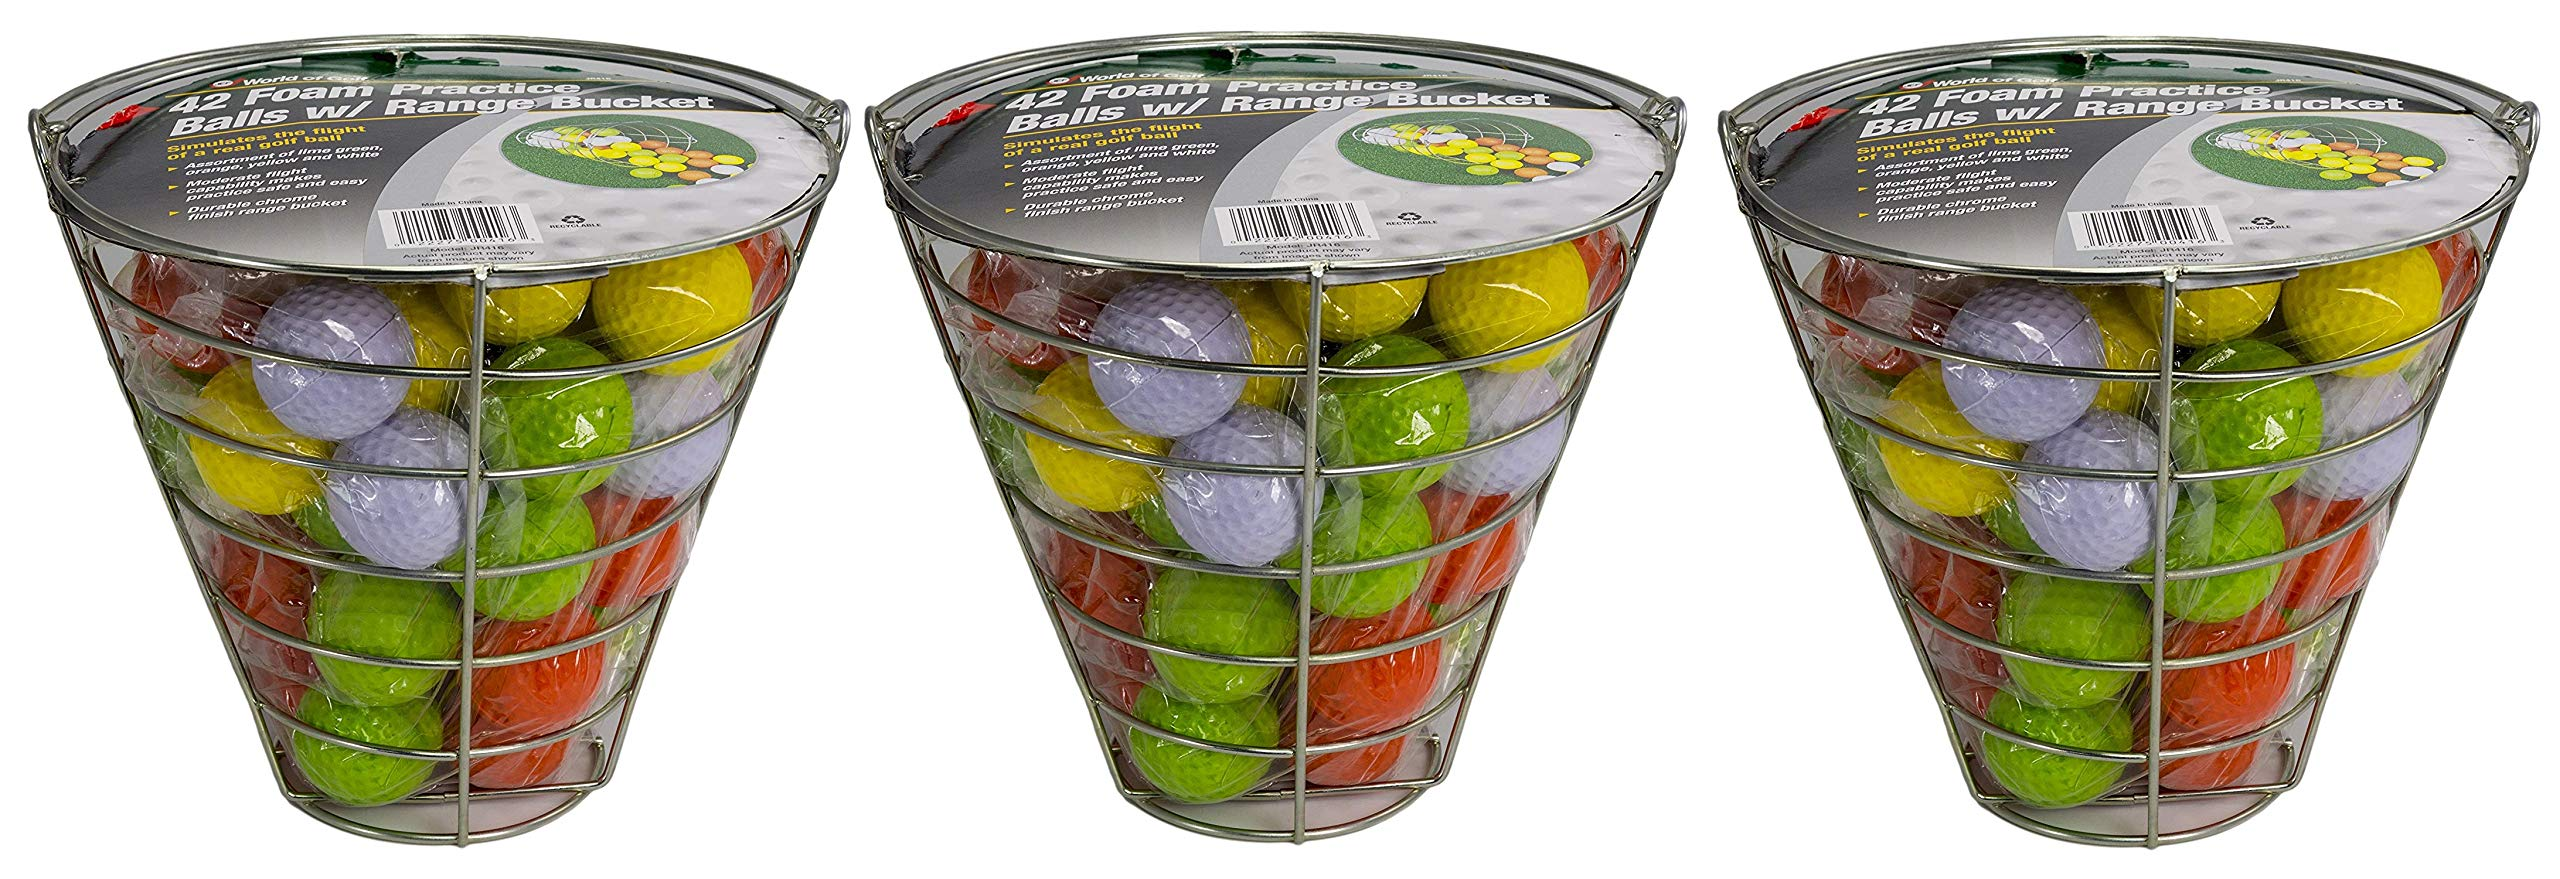 JEF WORLD OF GOLF Foam Practice Balls (42 Multi-Colored Balls) (3-(Pack of 42))